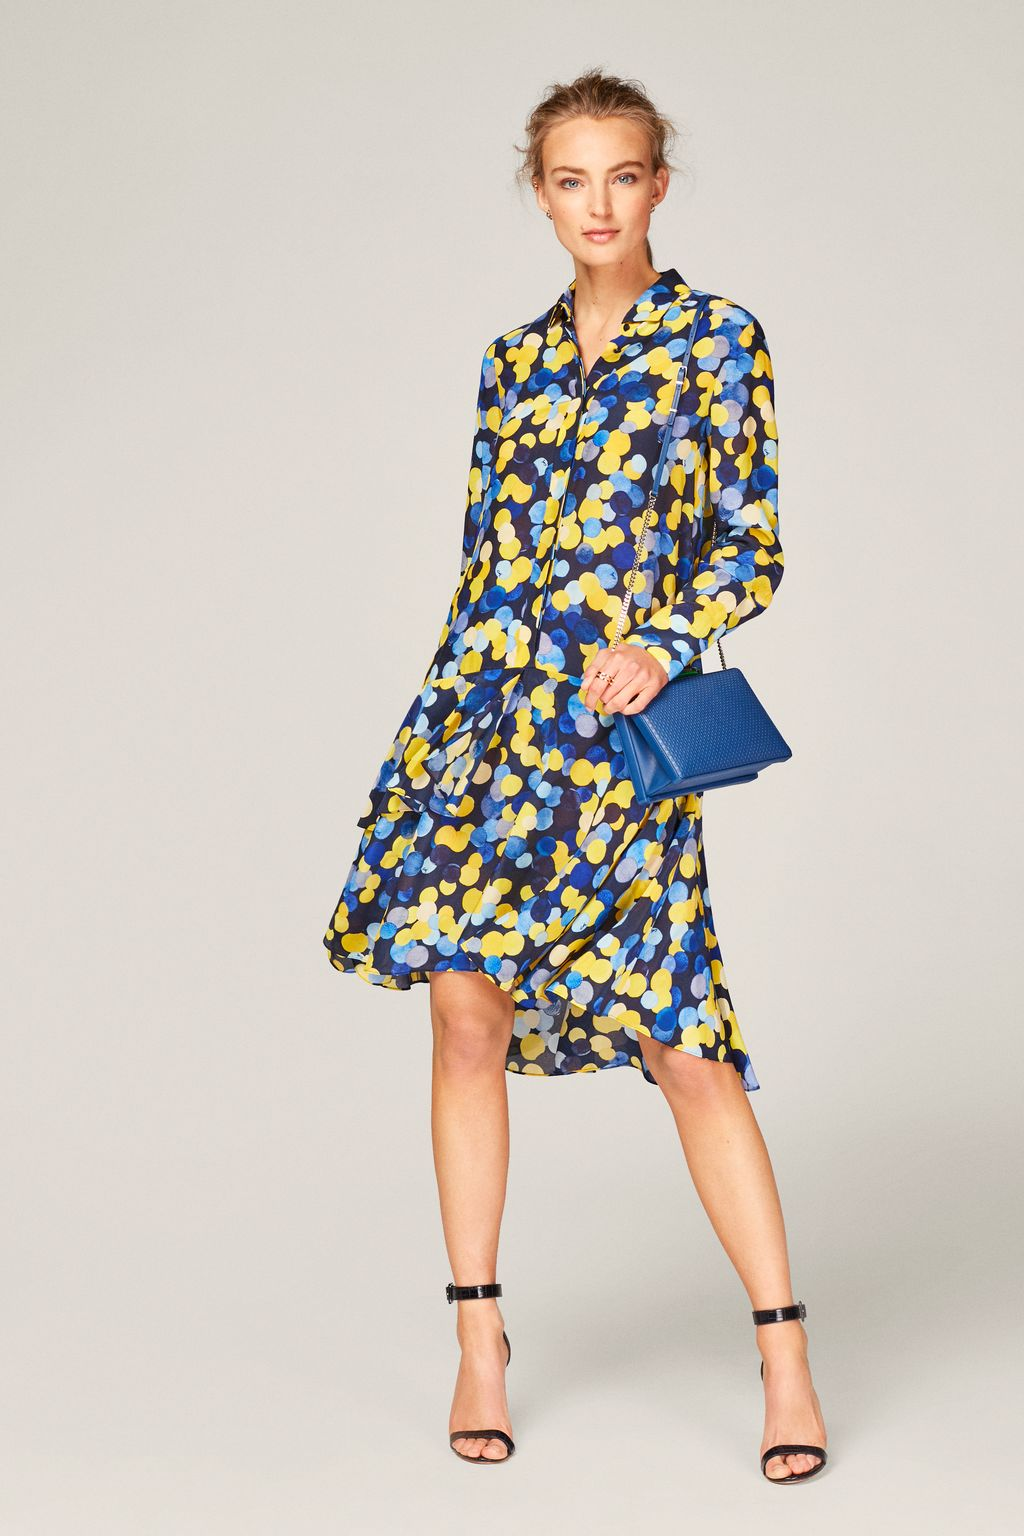 Confetti shirt dress